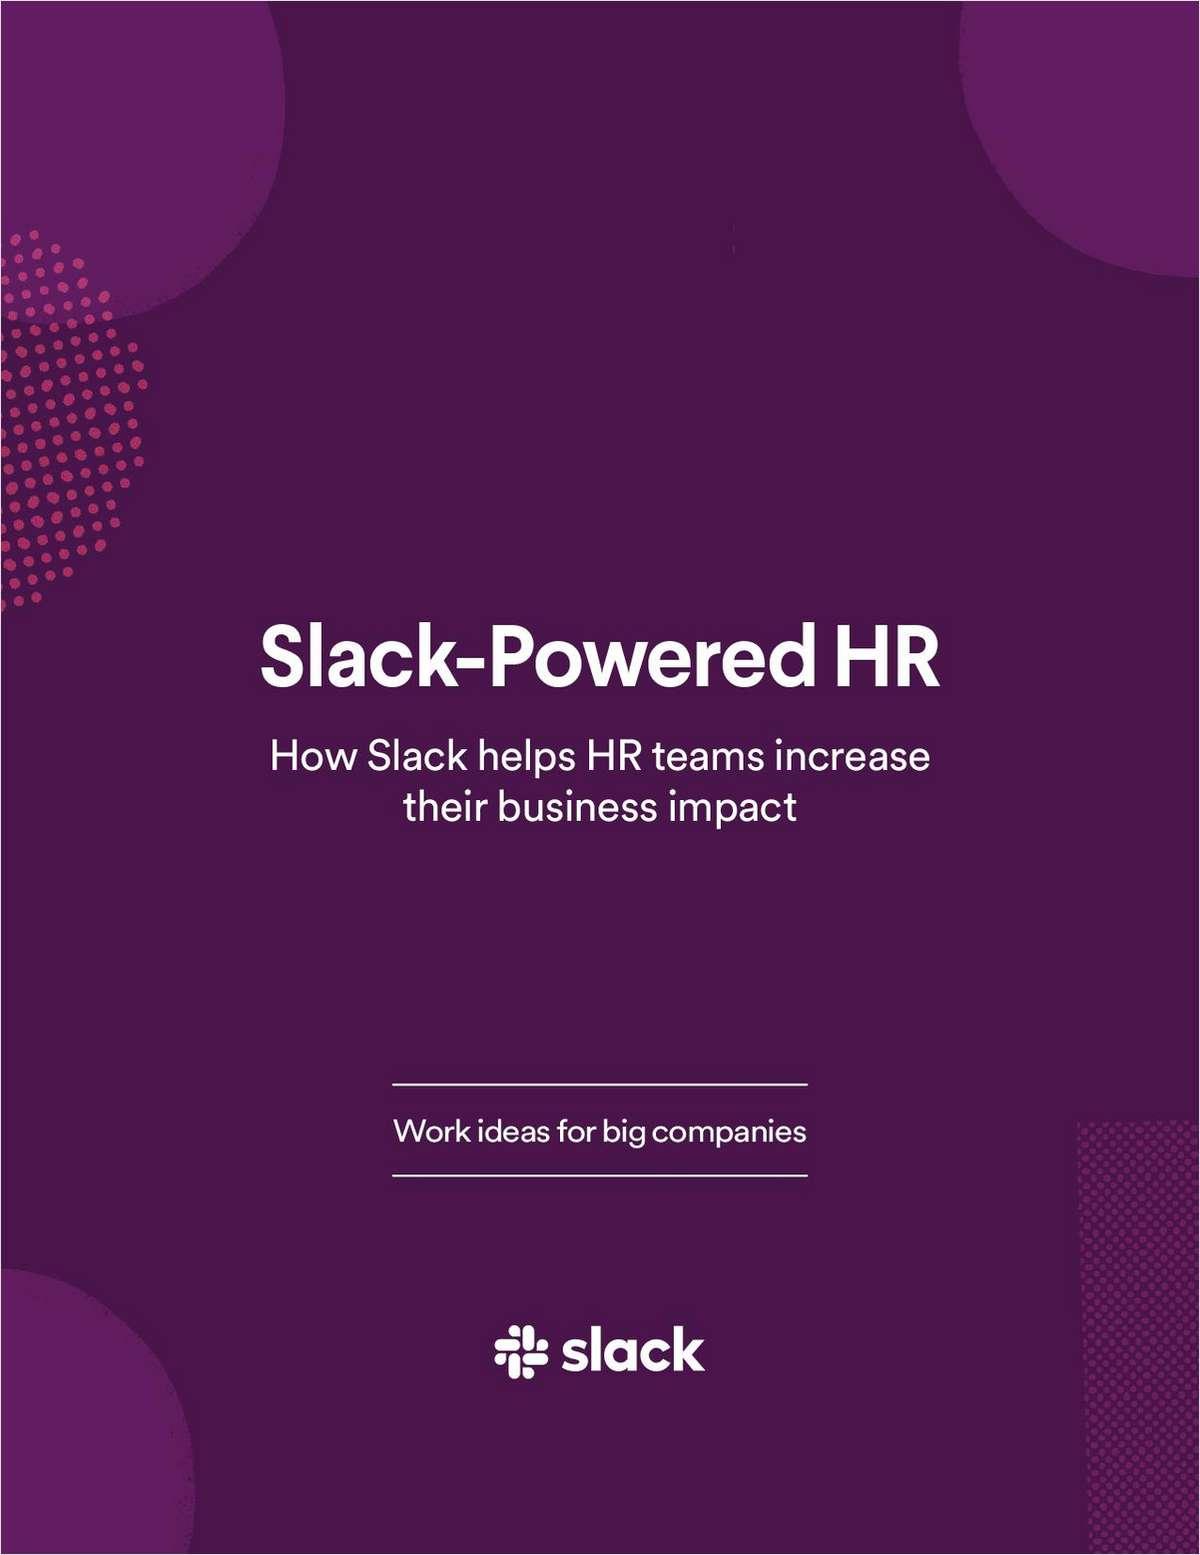 Slack-Powered HR